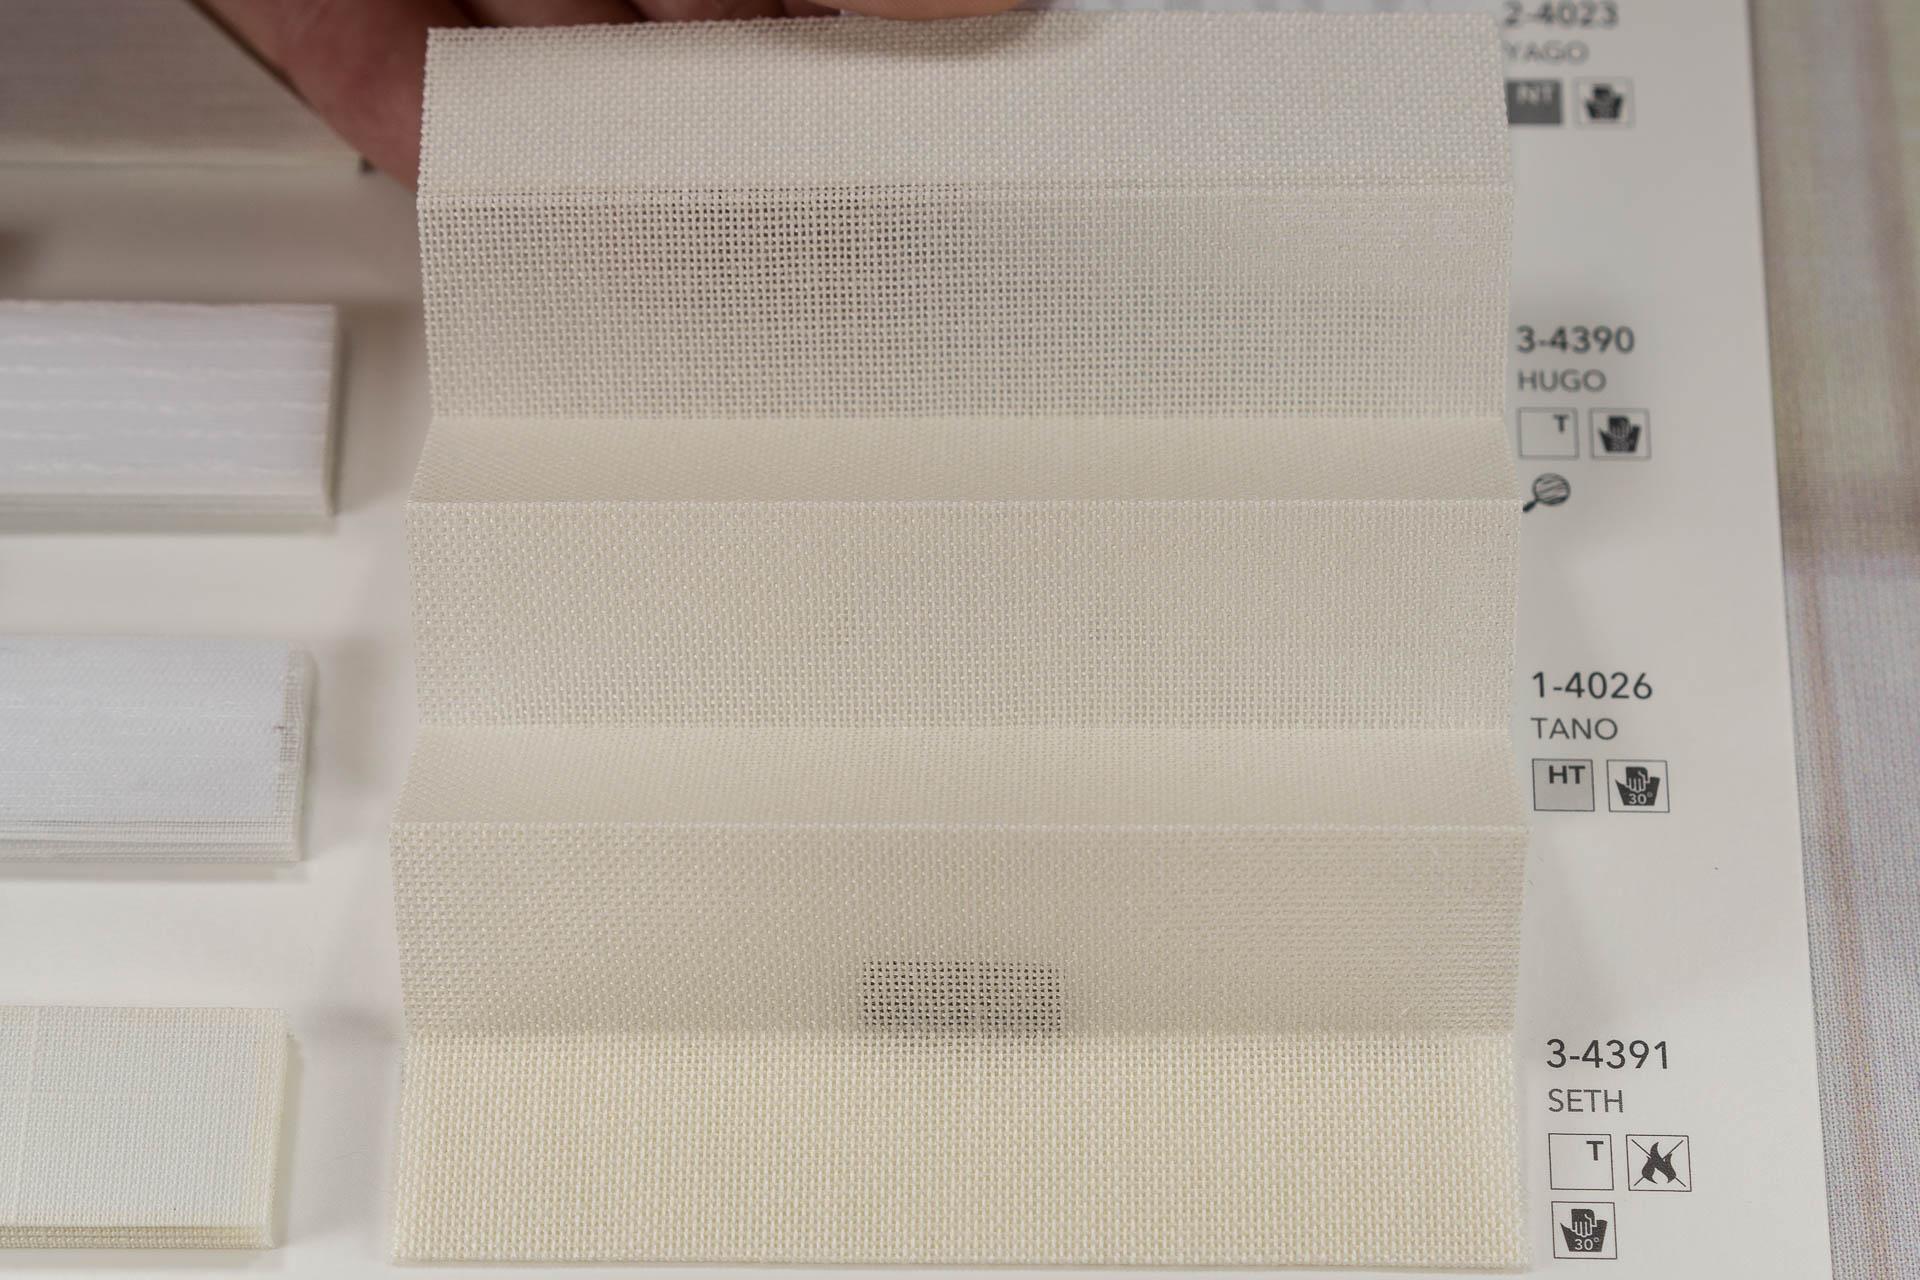 "MHZ Plissee Stoff Muster aus der Farbkarte ""3 white styles"" | Material: 100 % Trevira CS"